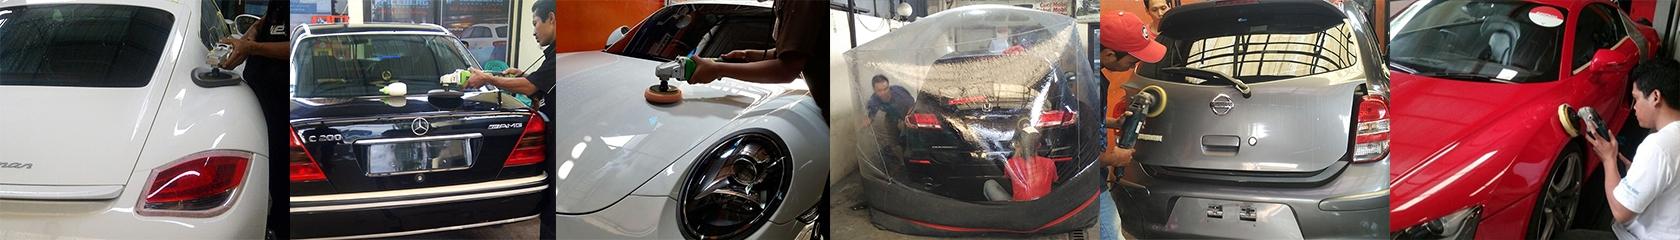 Aneka Film Poles Mobil dan Auto Detailing  Meruya Jakarta Barat dan Seluruh Jabodetabek, Jakarta Barat, Jakarta Pusat, Jakarta Utara, Jakarta Timur, Jakarta Selatan